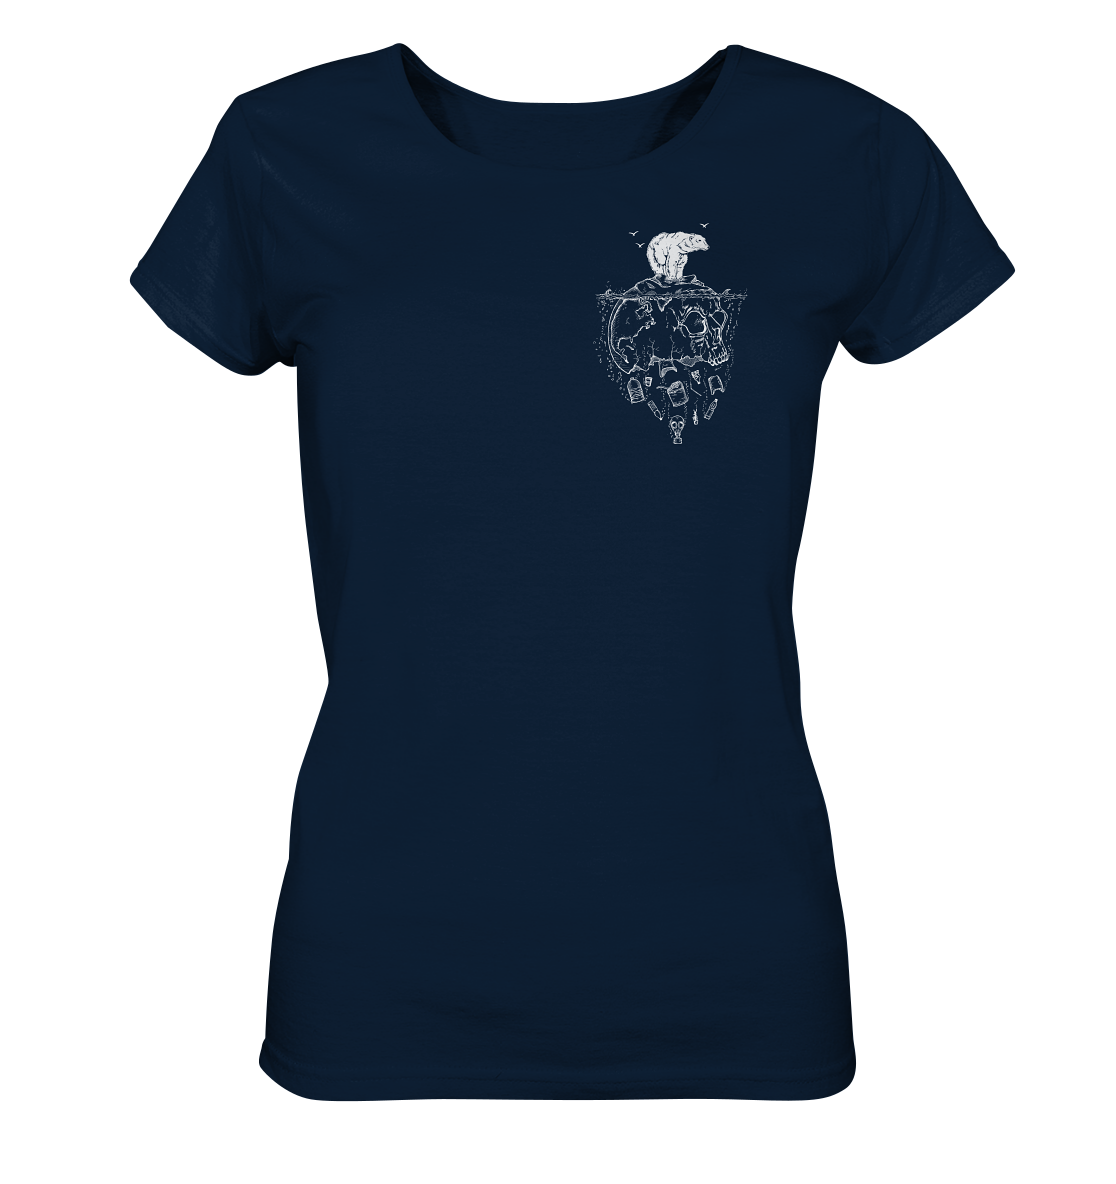 front-ladies-organic-shirt-0e2035-1116x-16.png